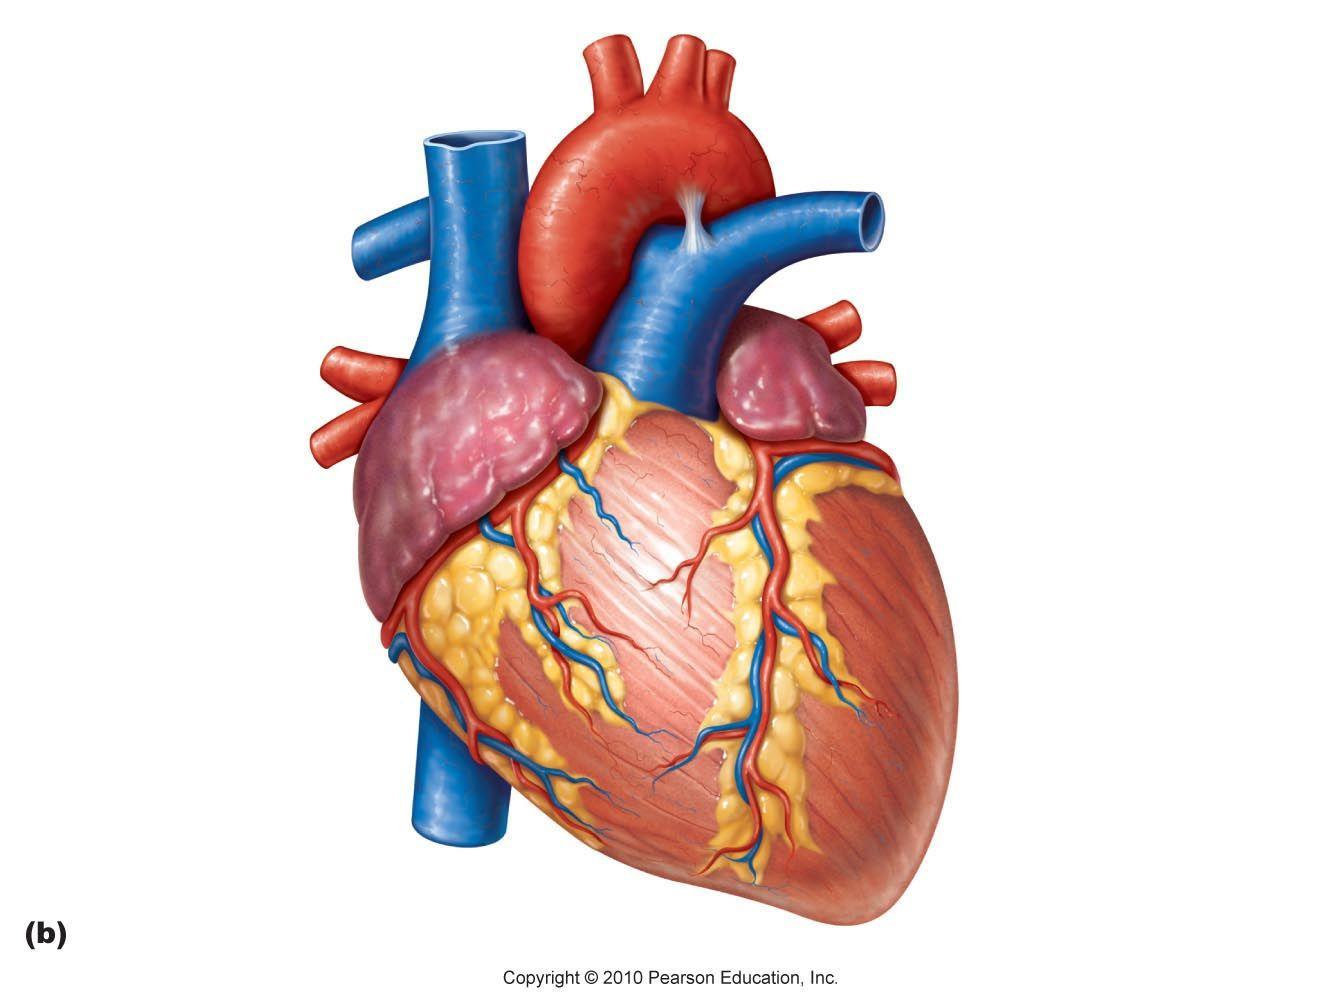 Vintage Red Real Heart Diagram Starfish Anatomy Xym2jsbpvxx3izvz8exubhqx Jpeg 13441008